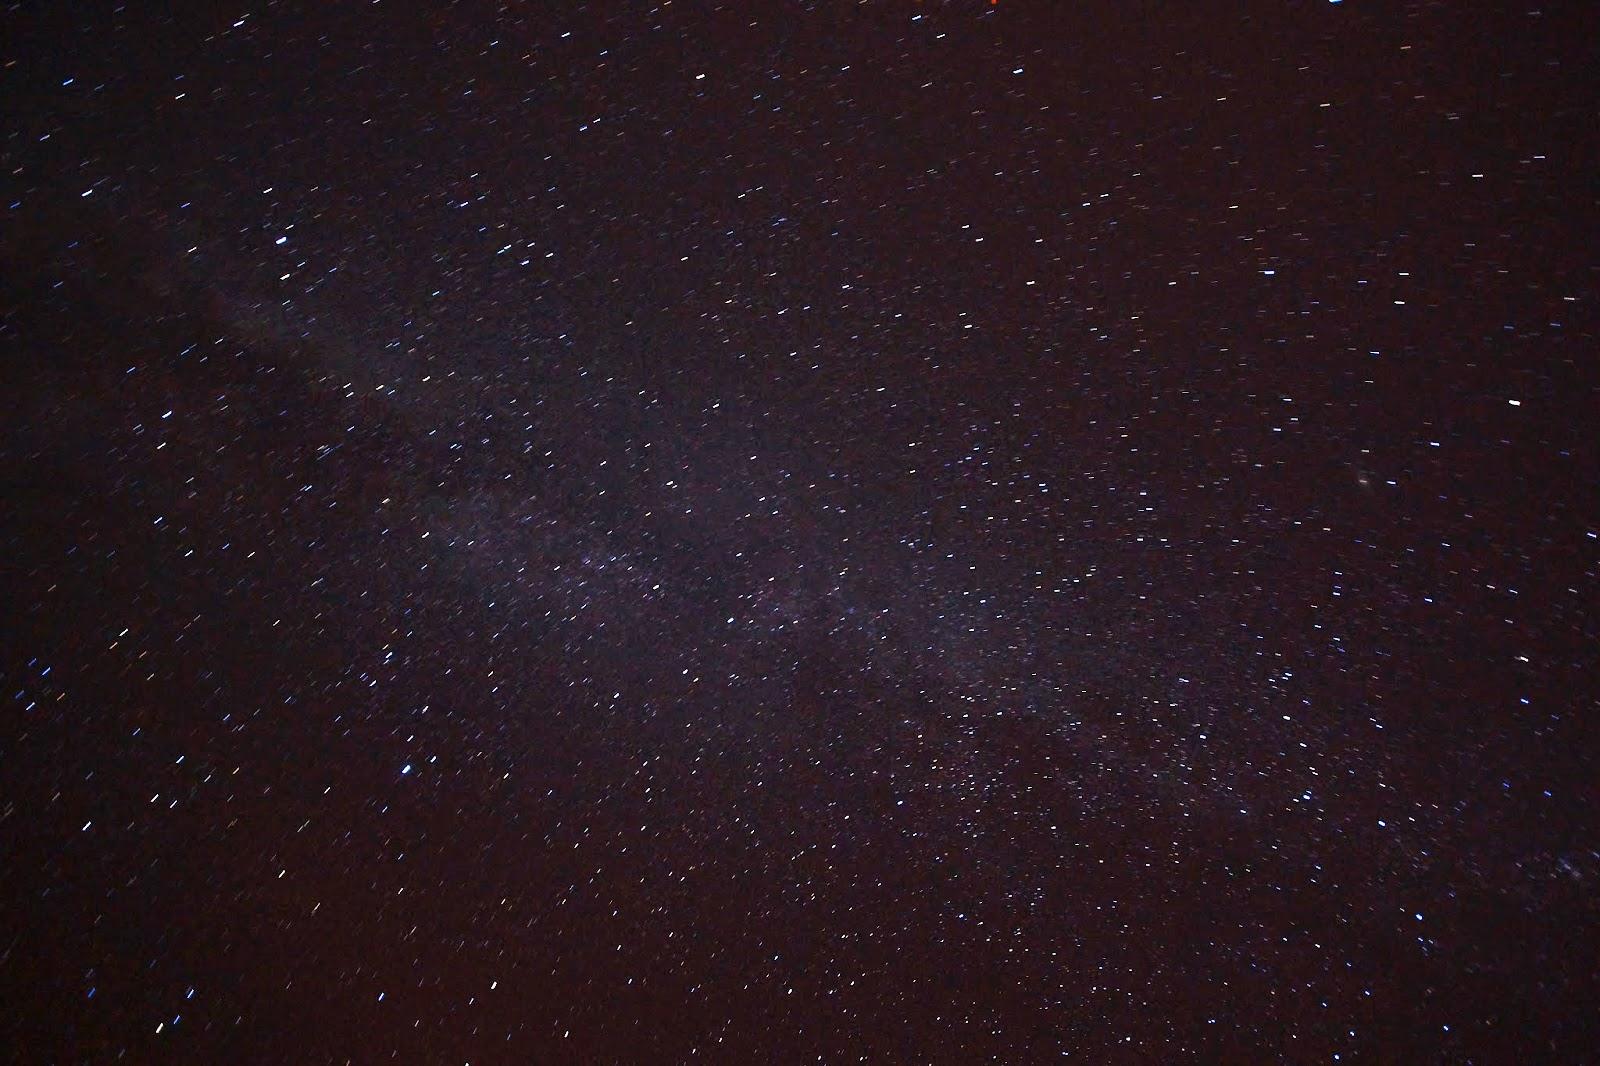 milky way, stars, astronomy, romania